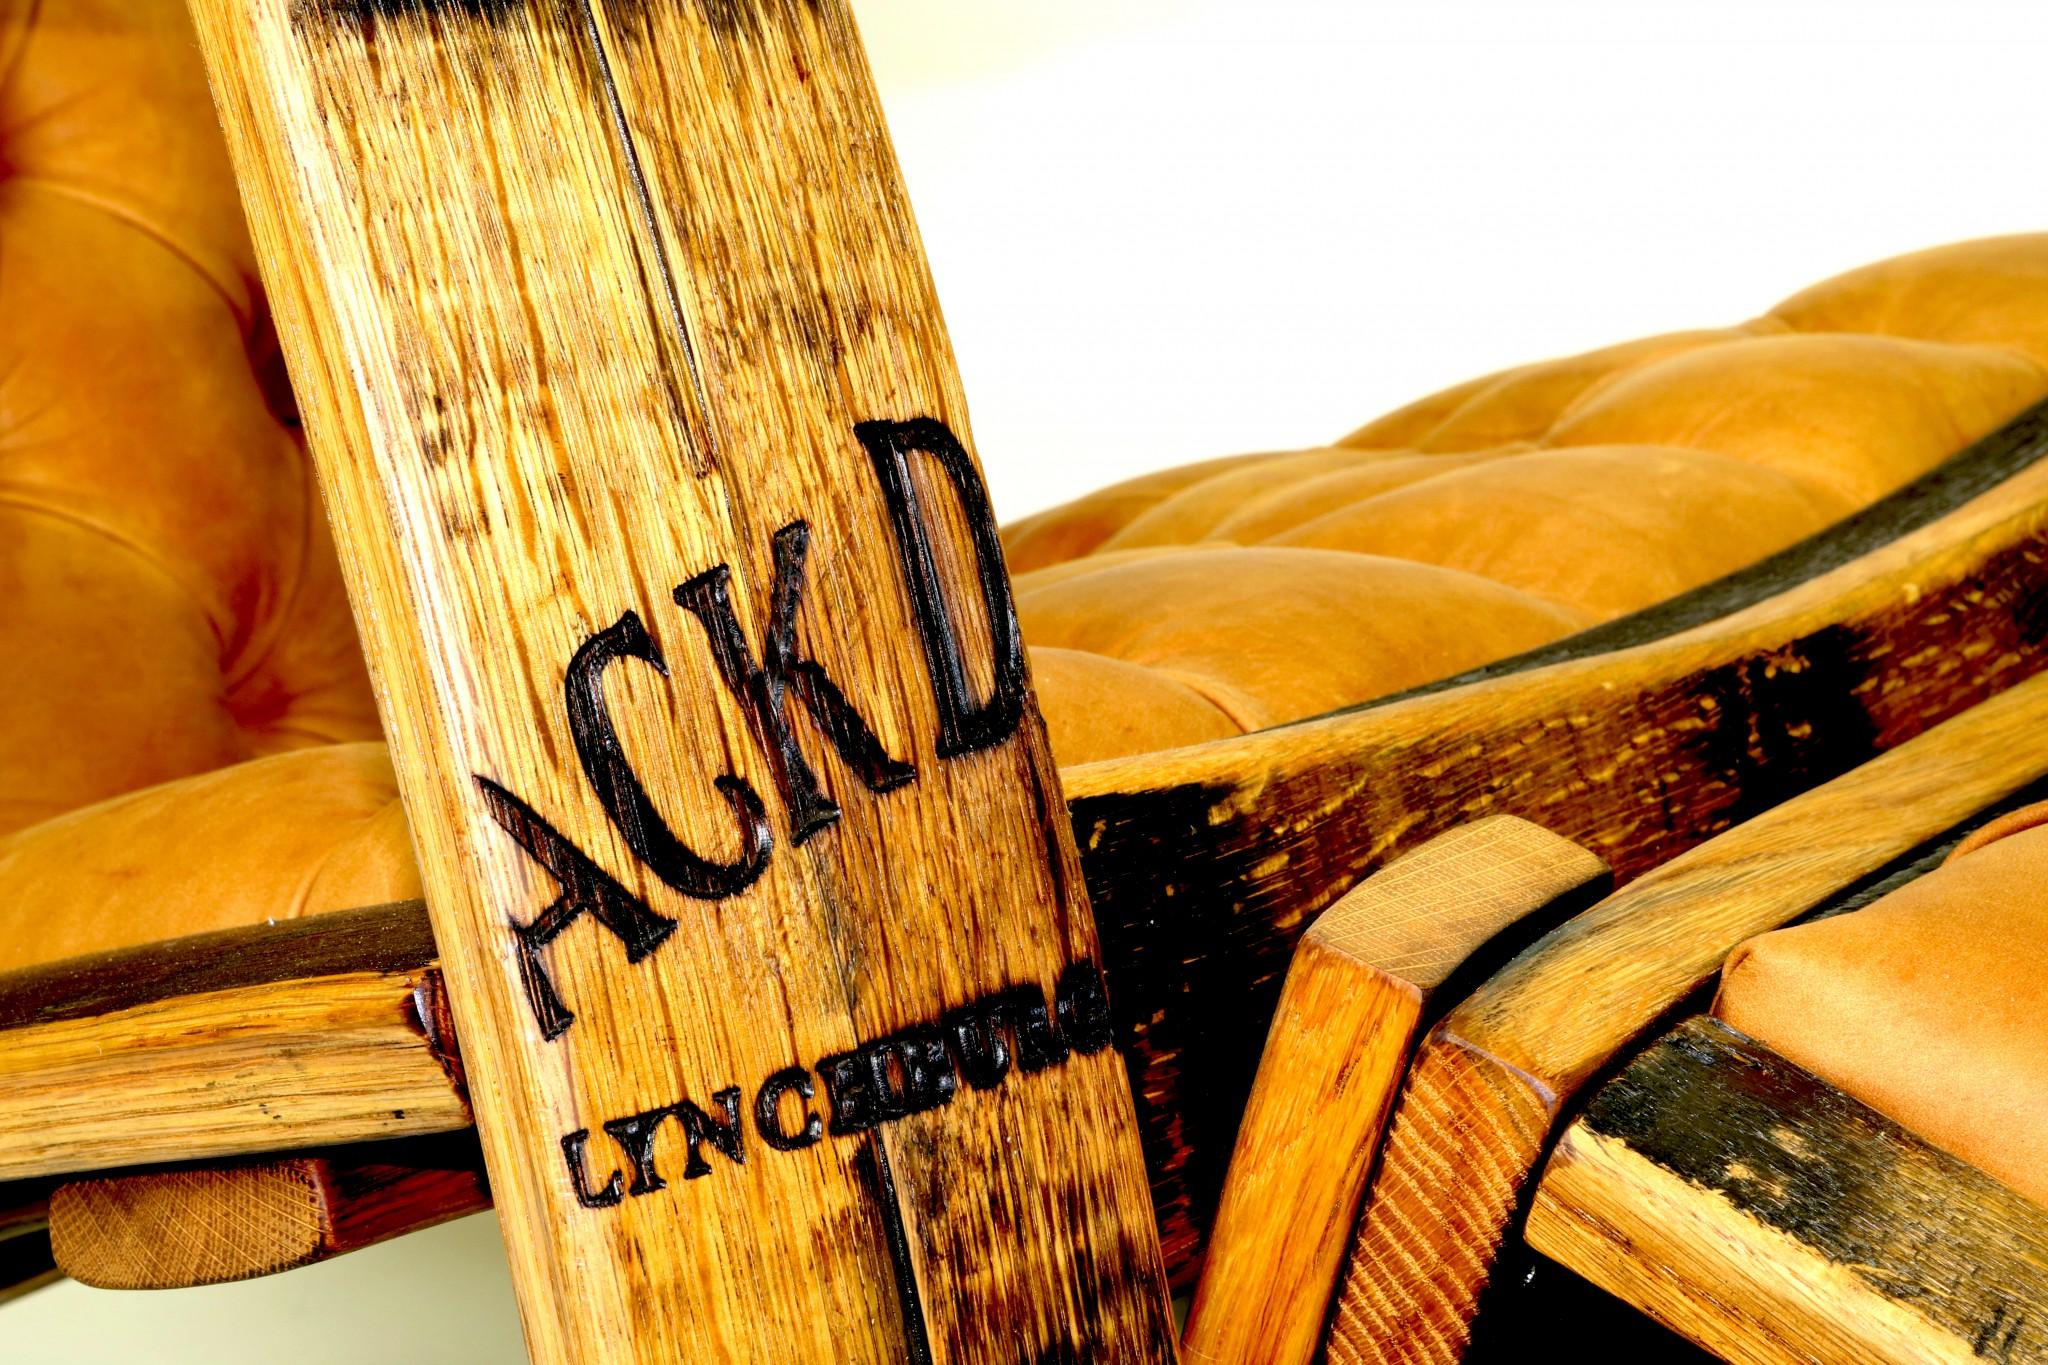 Hungarian Workshop Handmade Furniture Blog